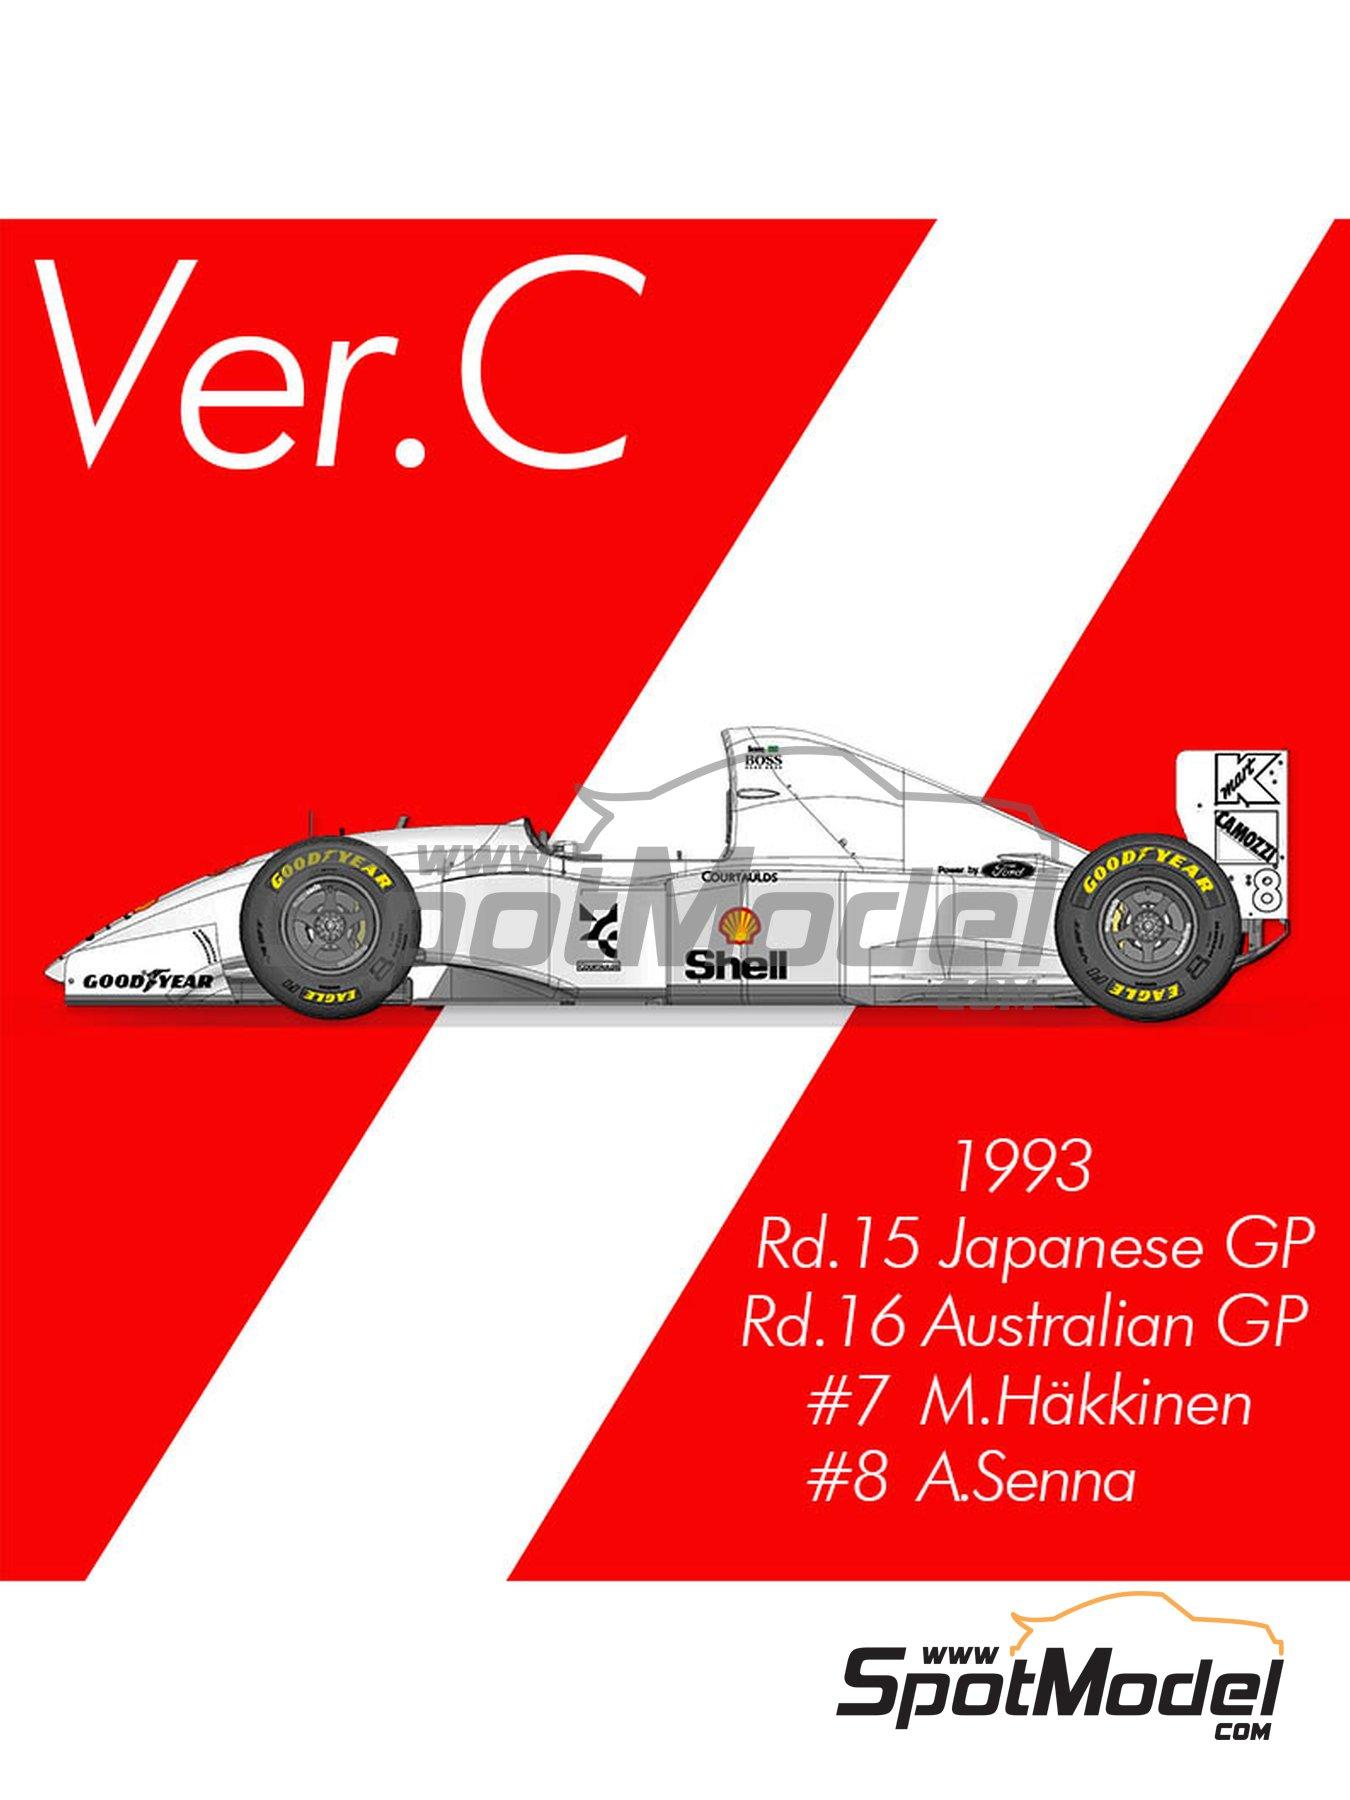 McLaren Ford MP4/8 Marlboro - Australian Grand Prix, Japan Grand Prix 1993 | Model car kit in 1/12 scale manufactured by Model Factory Hiro (ref.MFH-K661) image